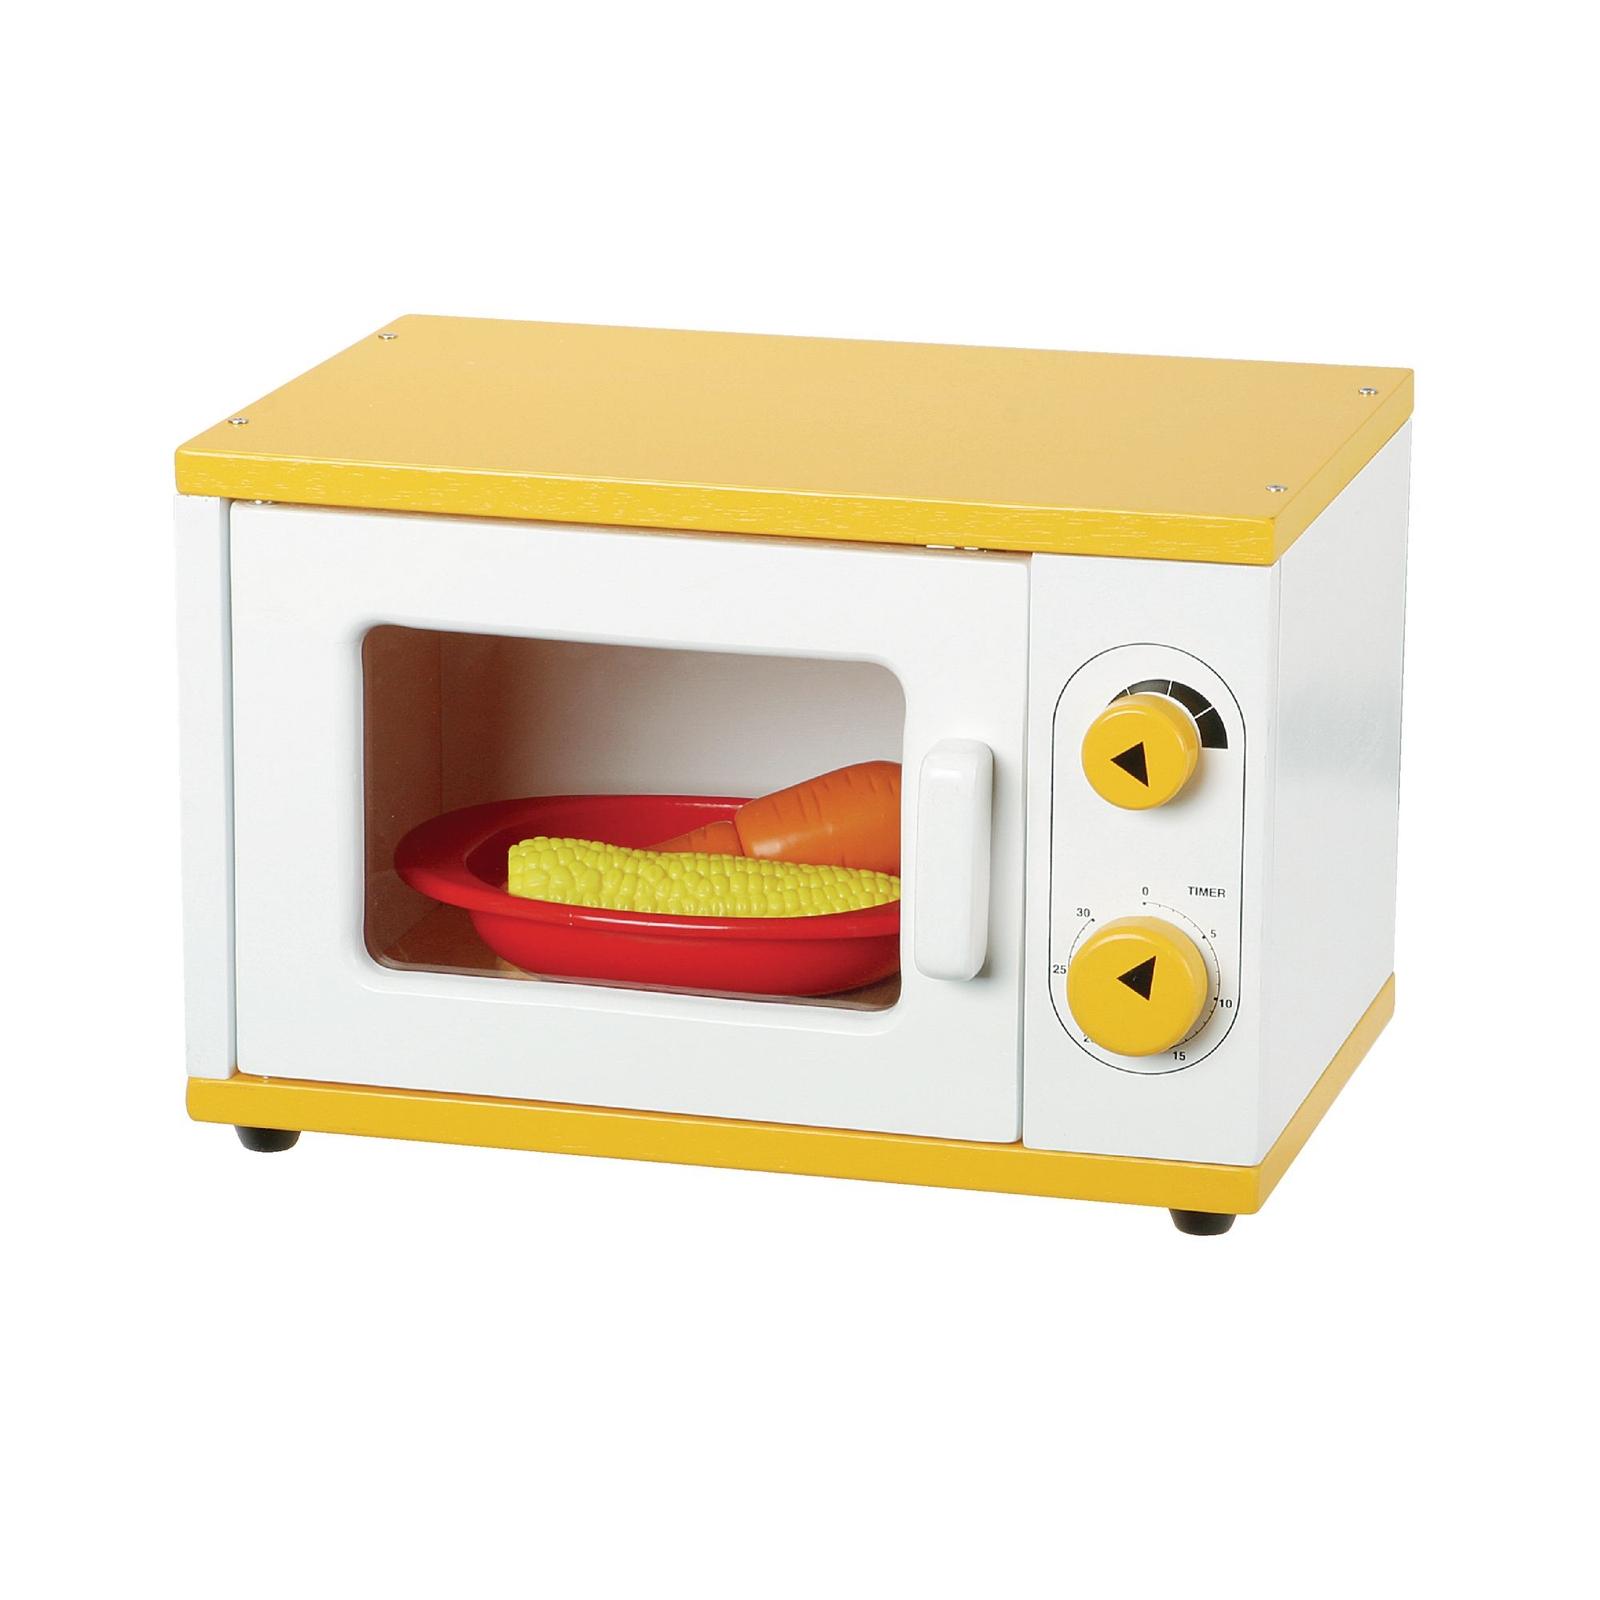 Microwave 390x380x260mm